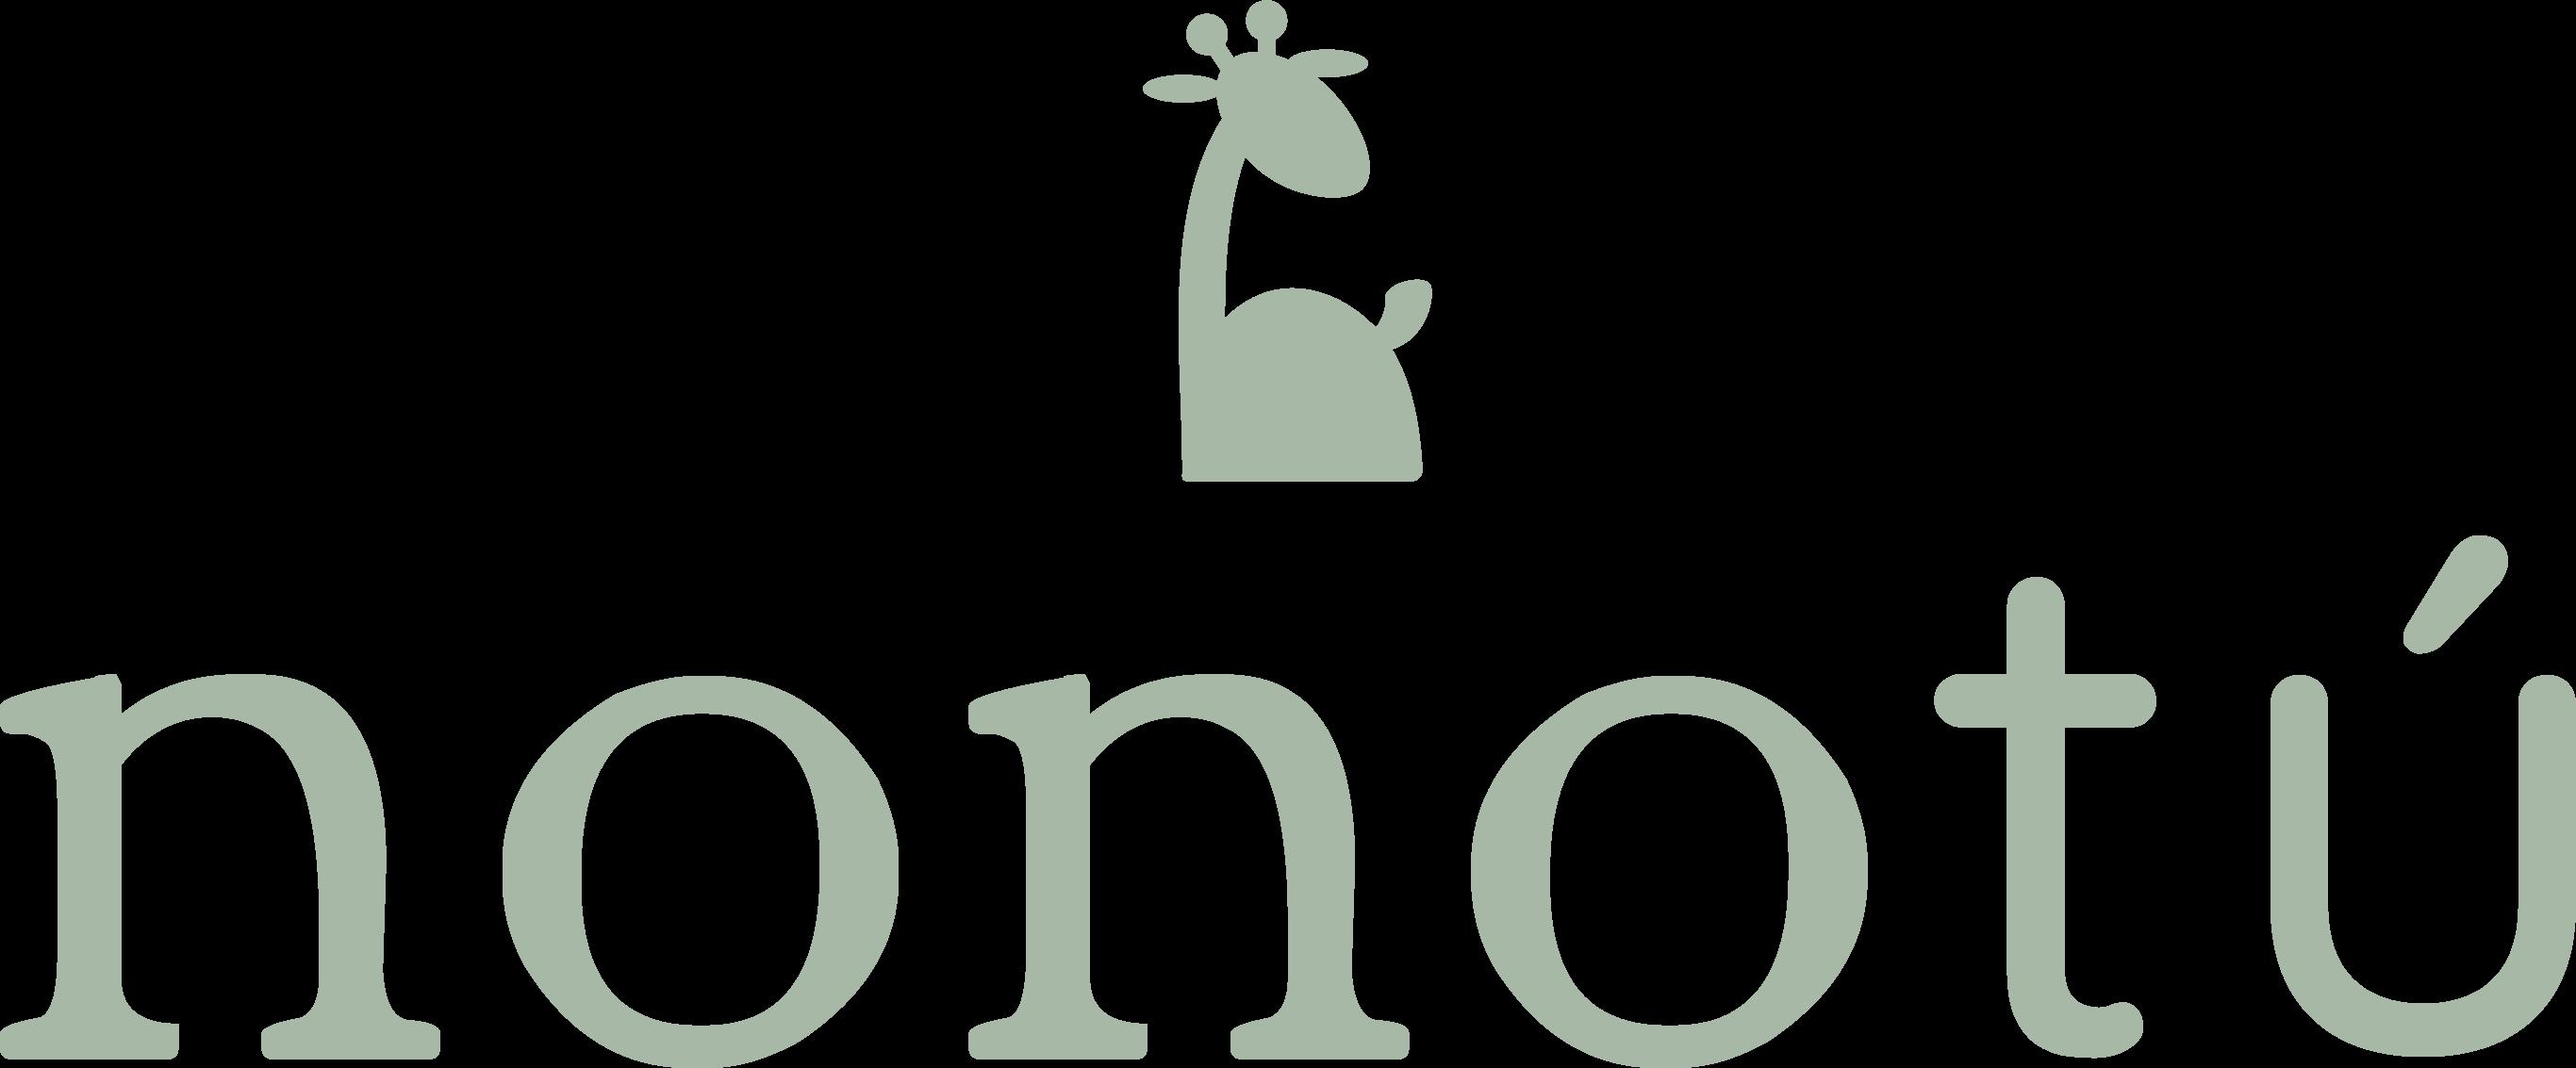 Nonotú